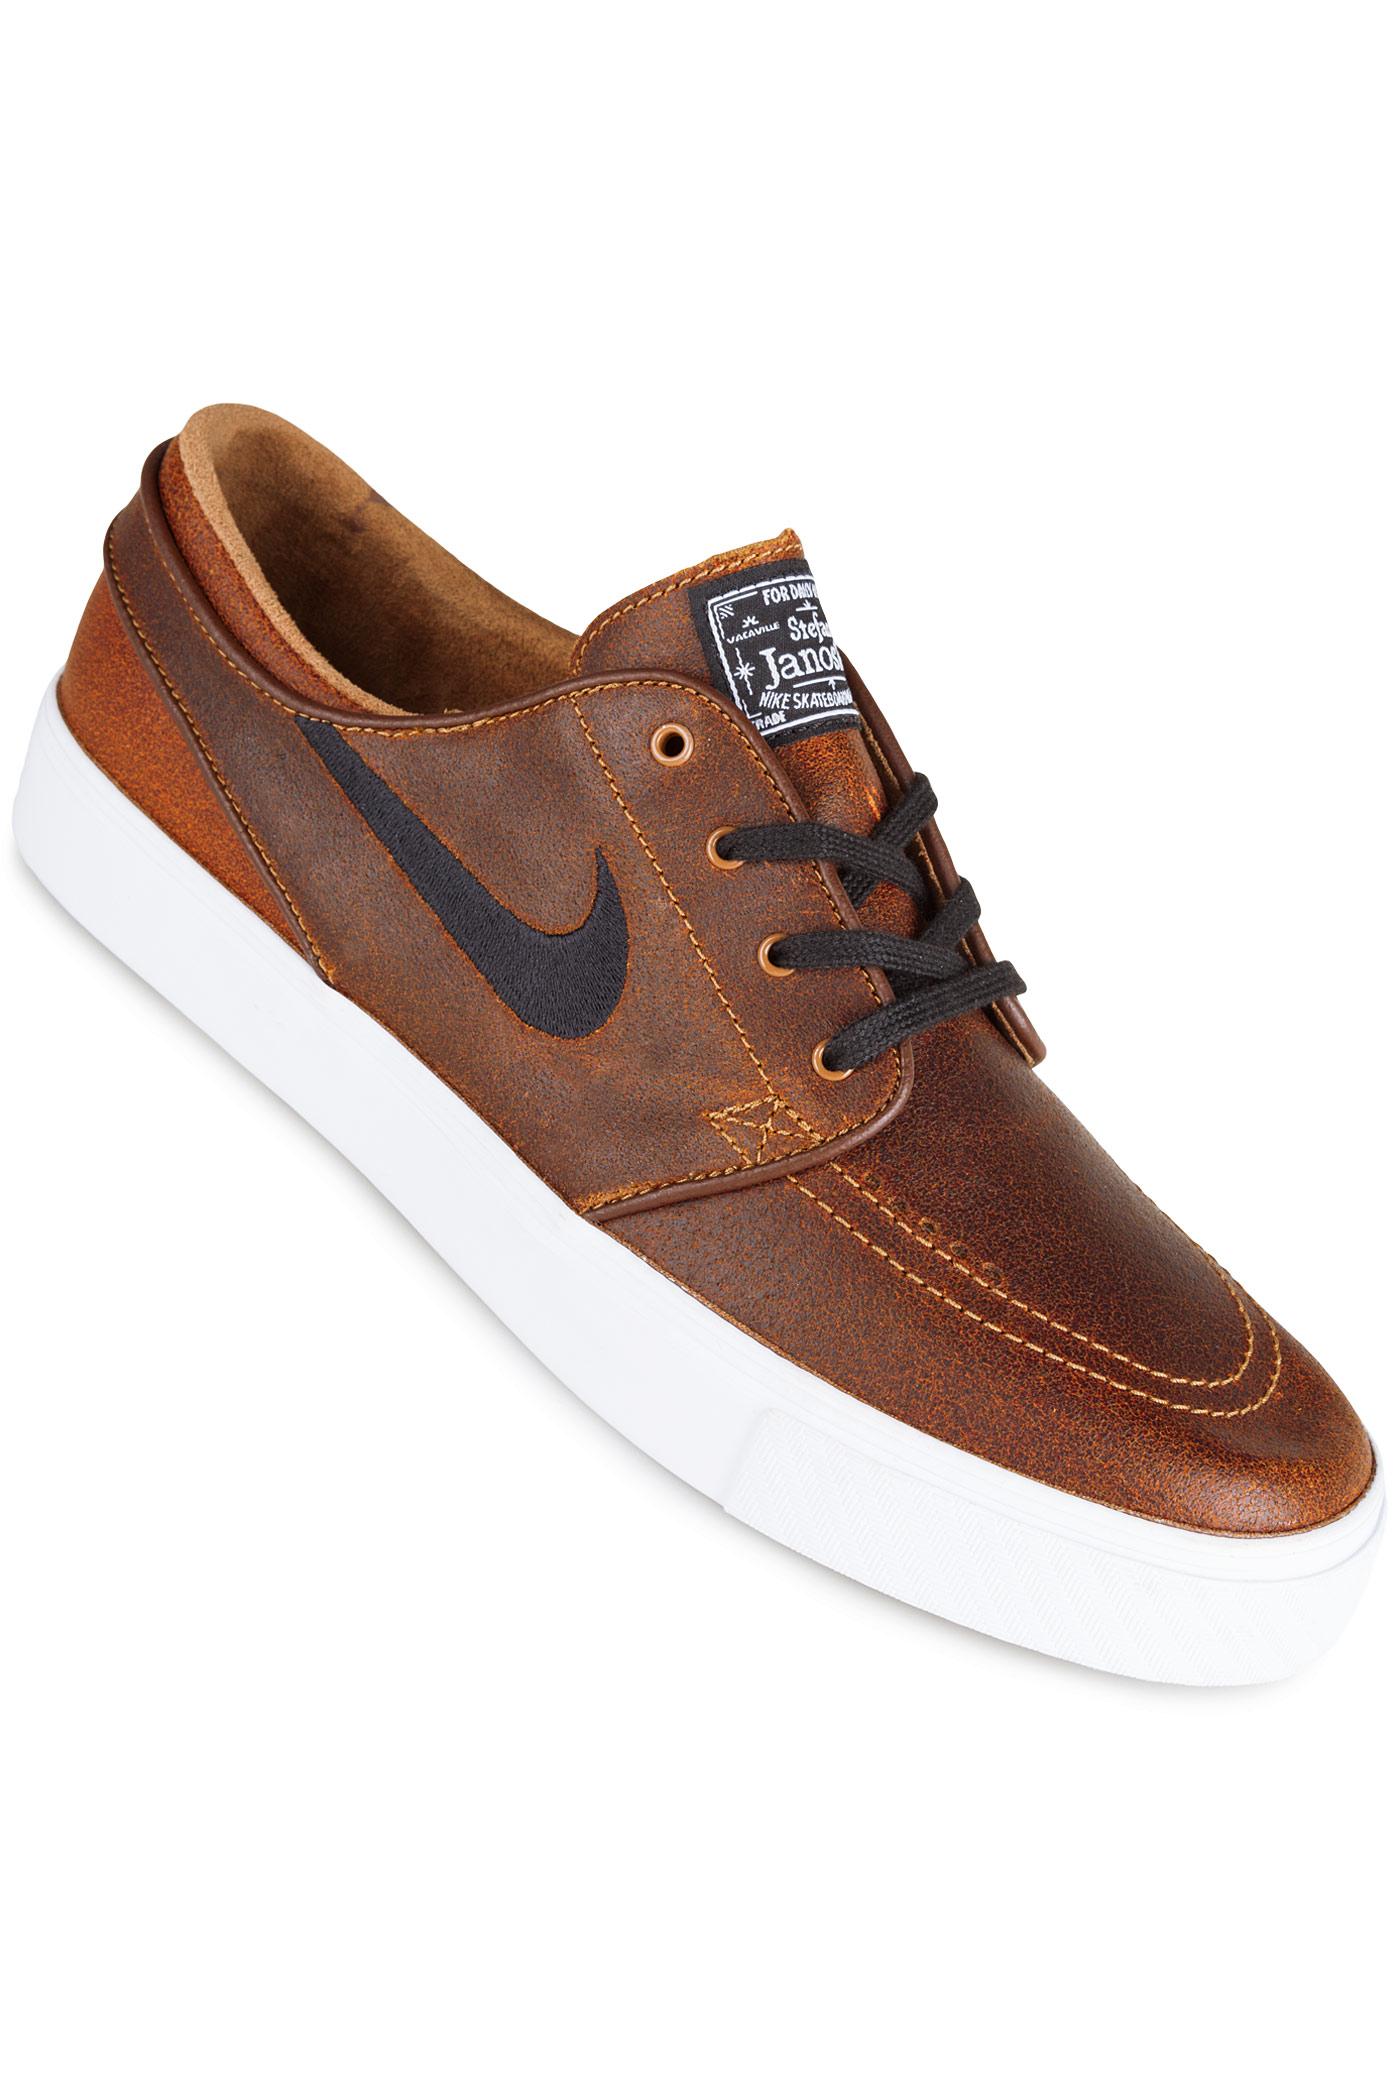 new product 7dbed 632e9 Nike SB Zoom Stefan Janoski Elite Shoes (ale brown black)